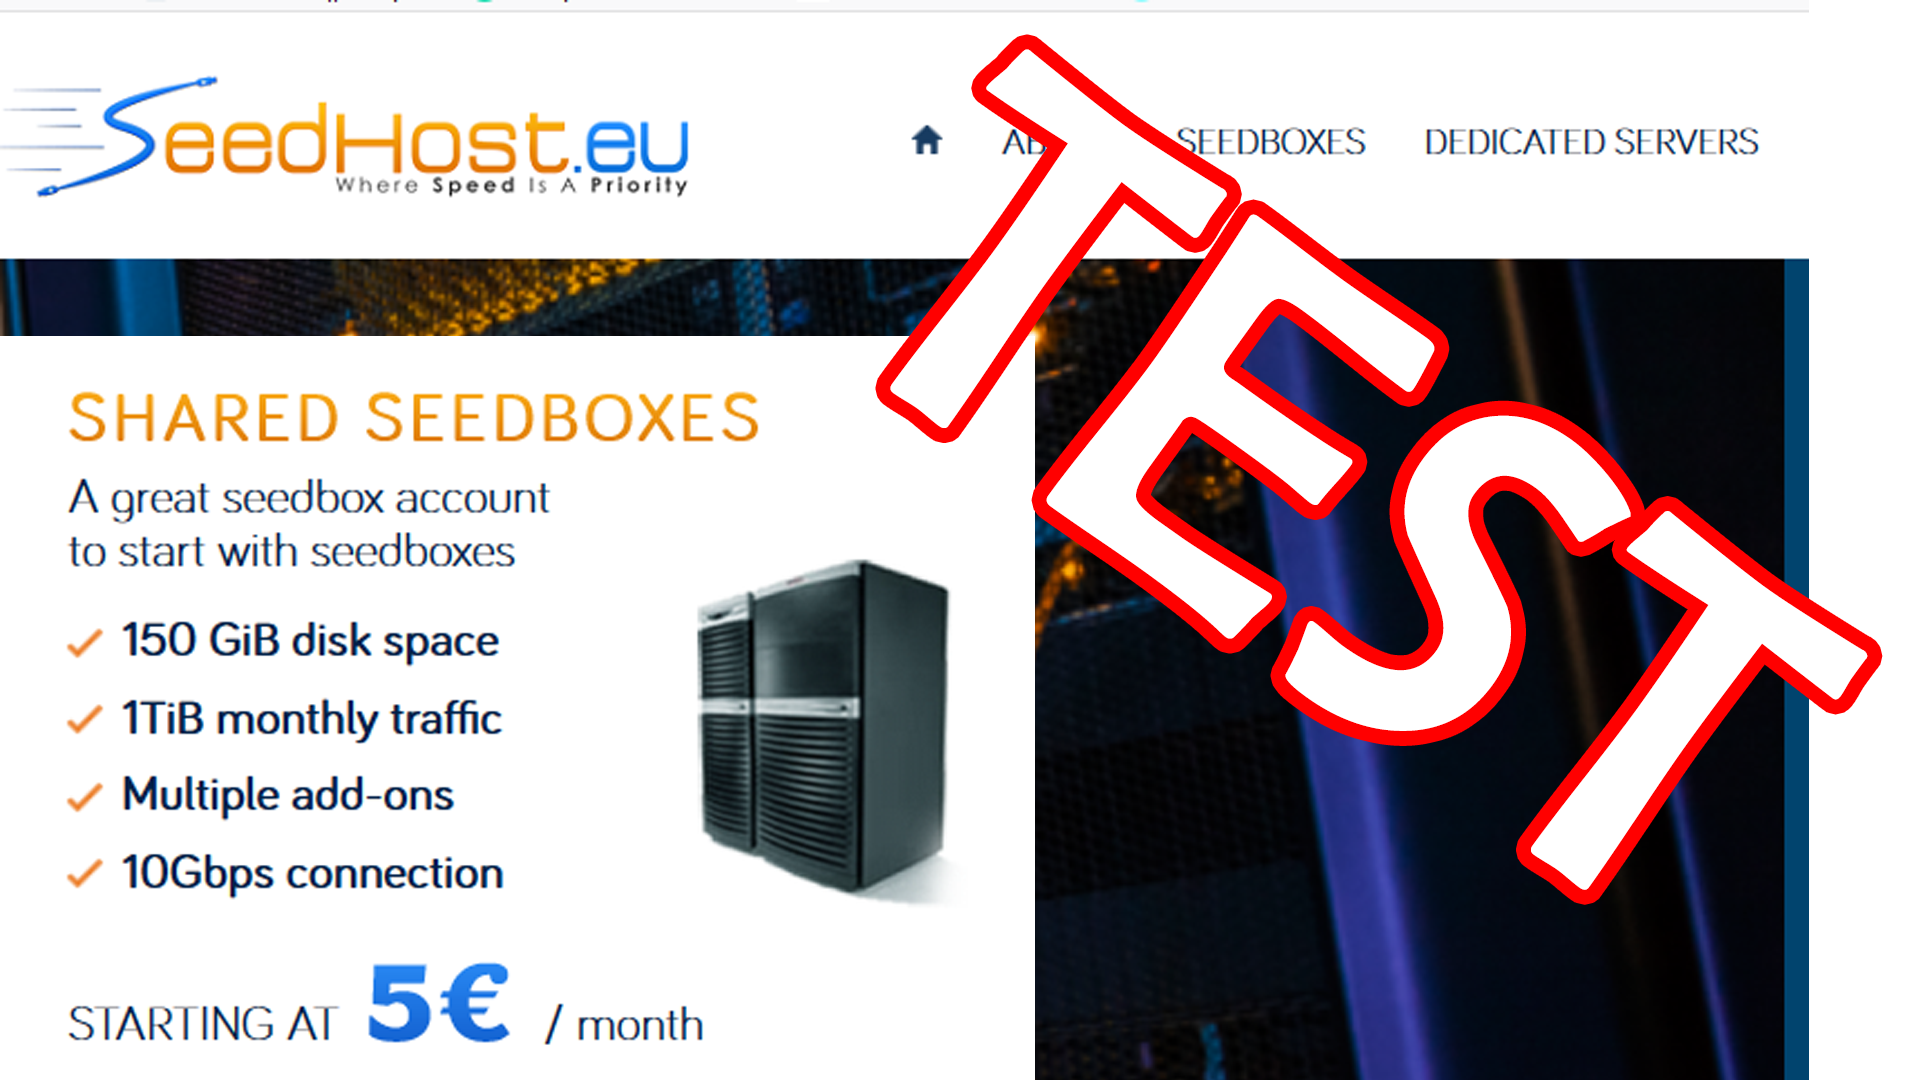 Review: Seedbox at Seedhost eu (Video) - UsefulVid